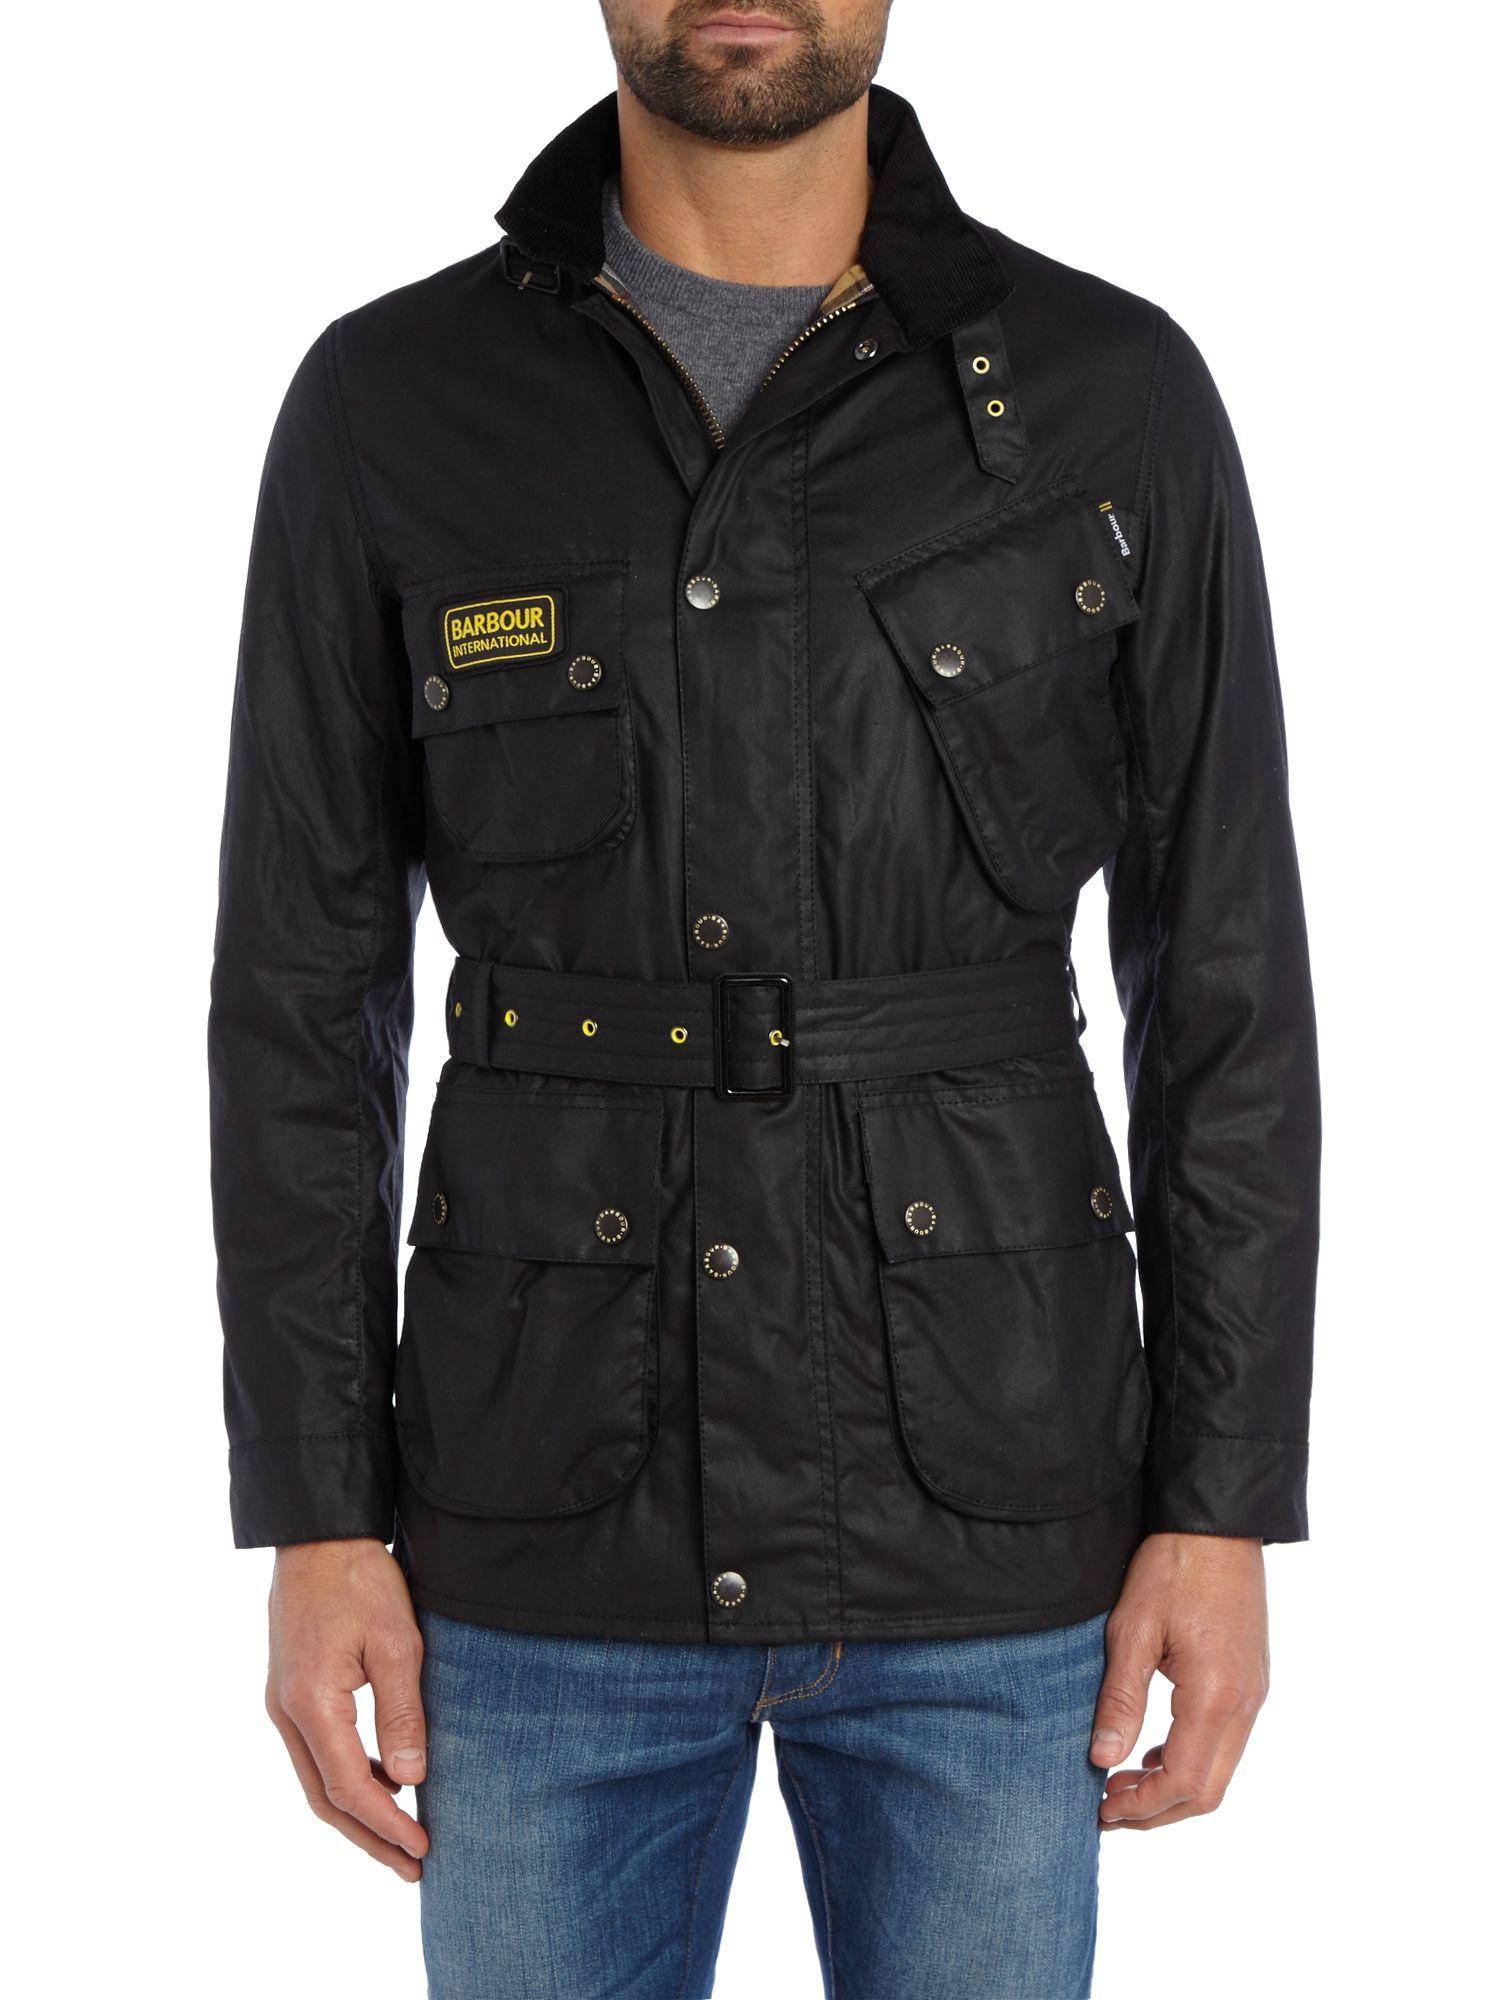 Barbour Slim International Wax Jacket in Black for Men